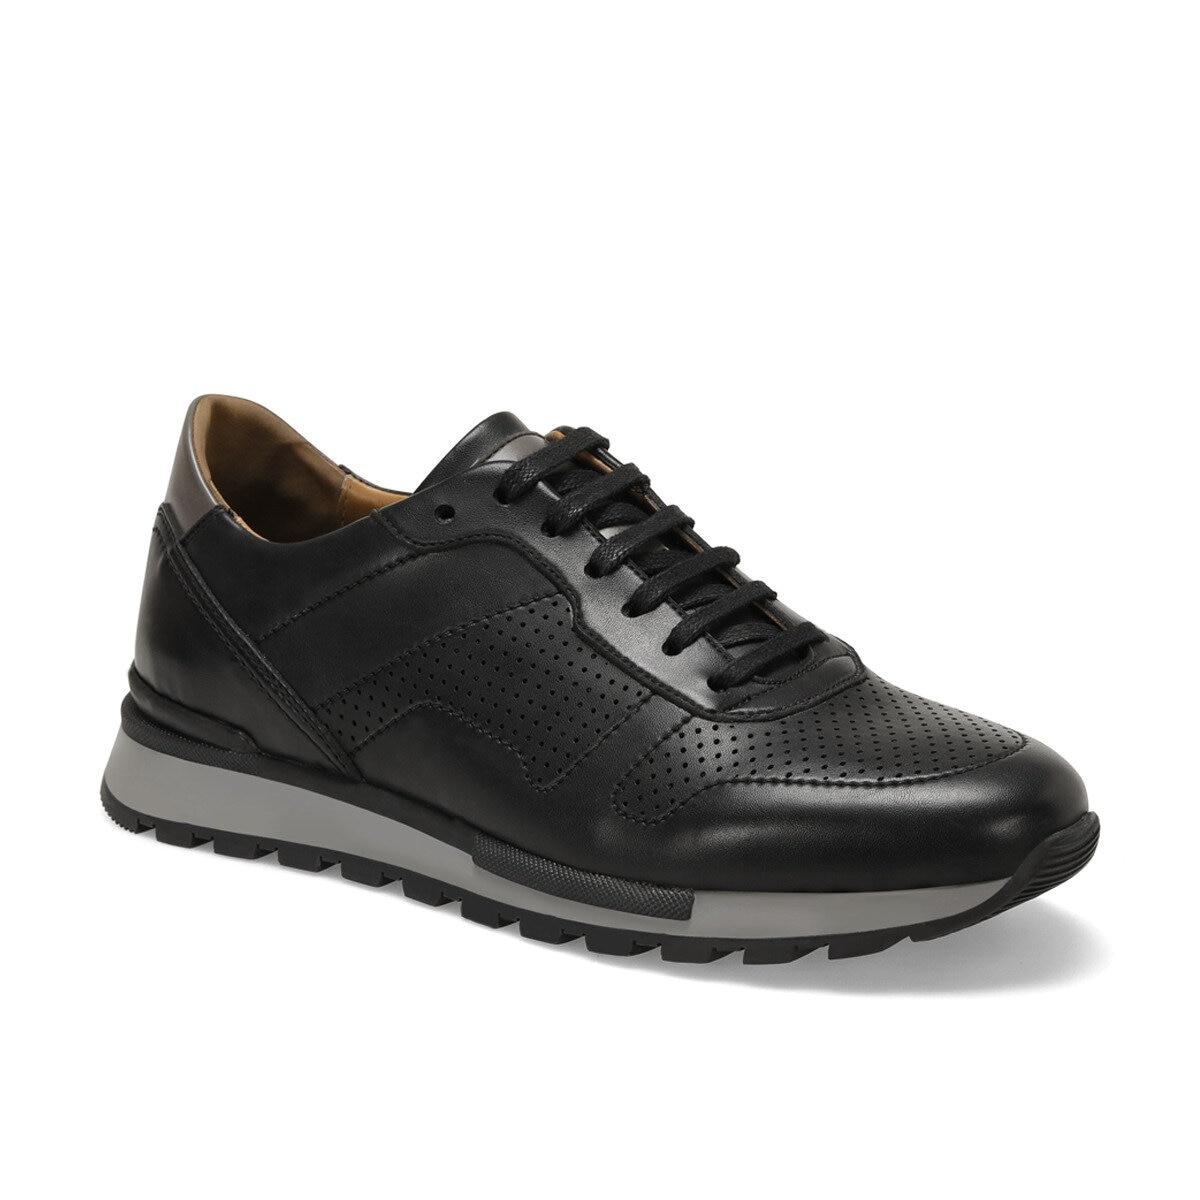 FLO ULS305 C 19 Black Men 'S Sneaker Shoes Oxide